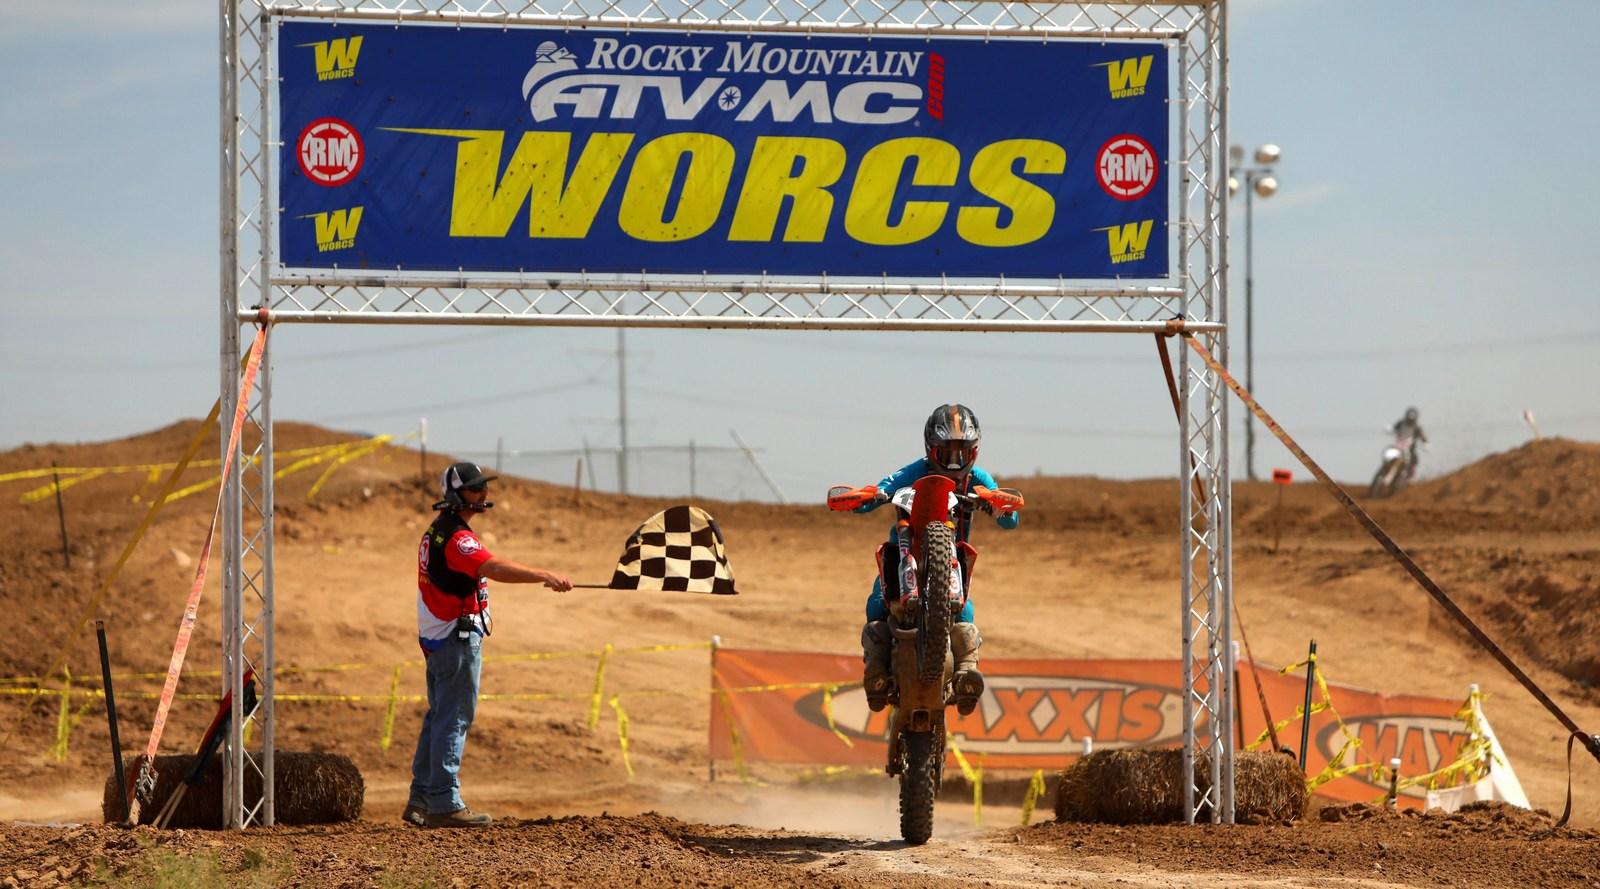 2019-04-brandy-richards-finish-worcs-racing